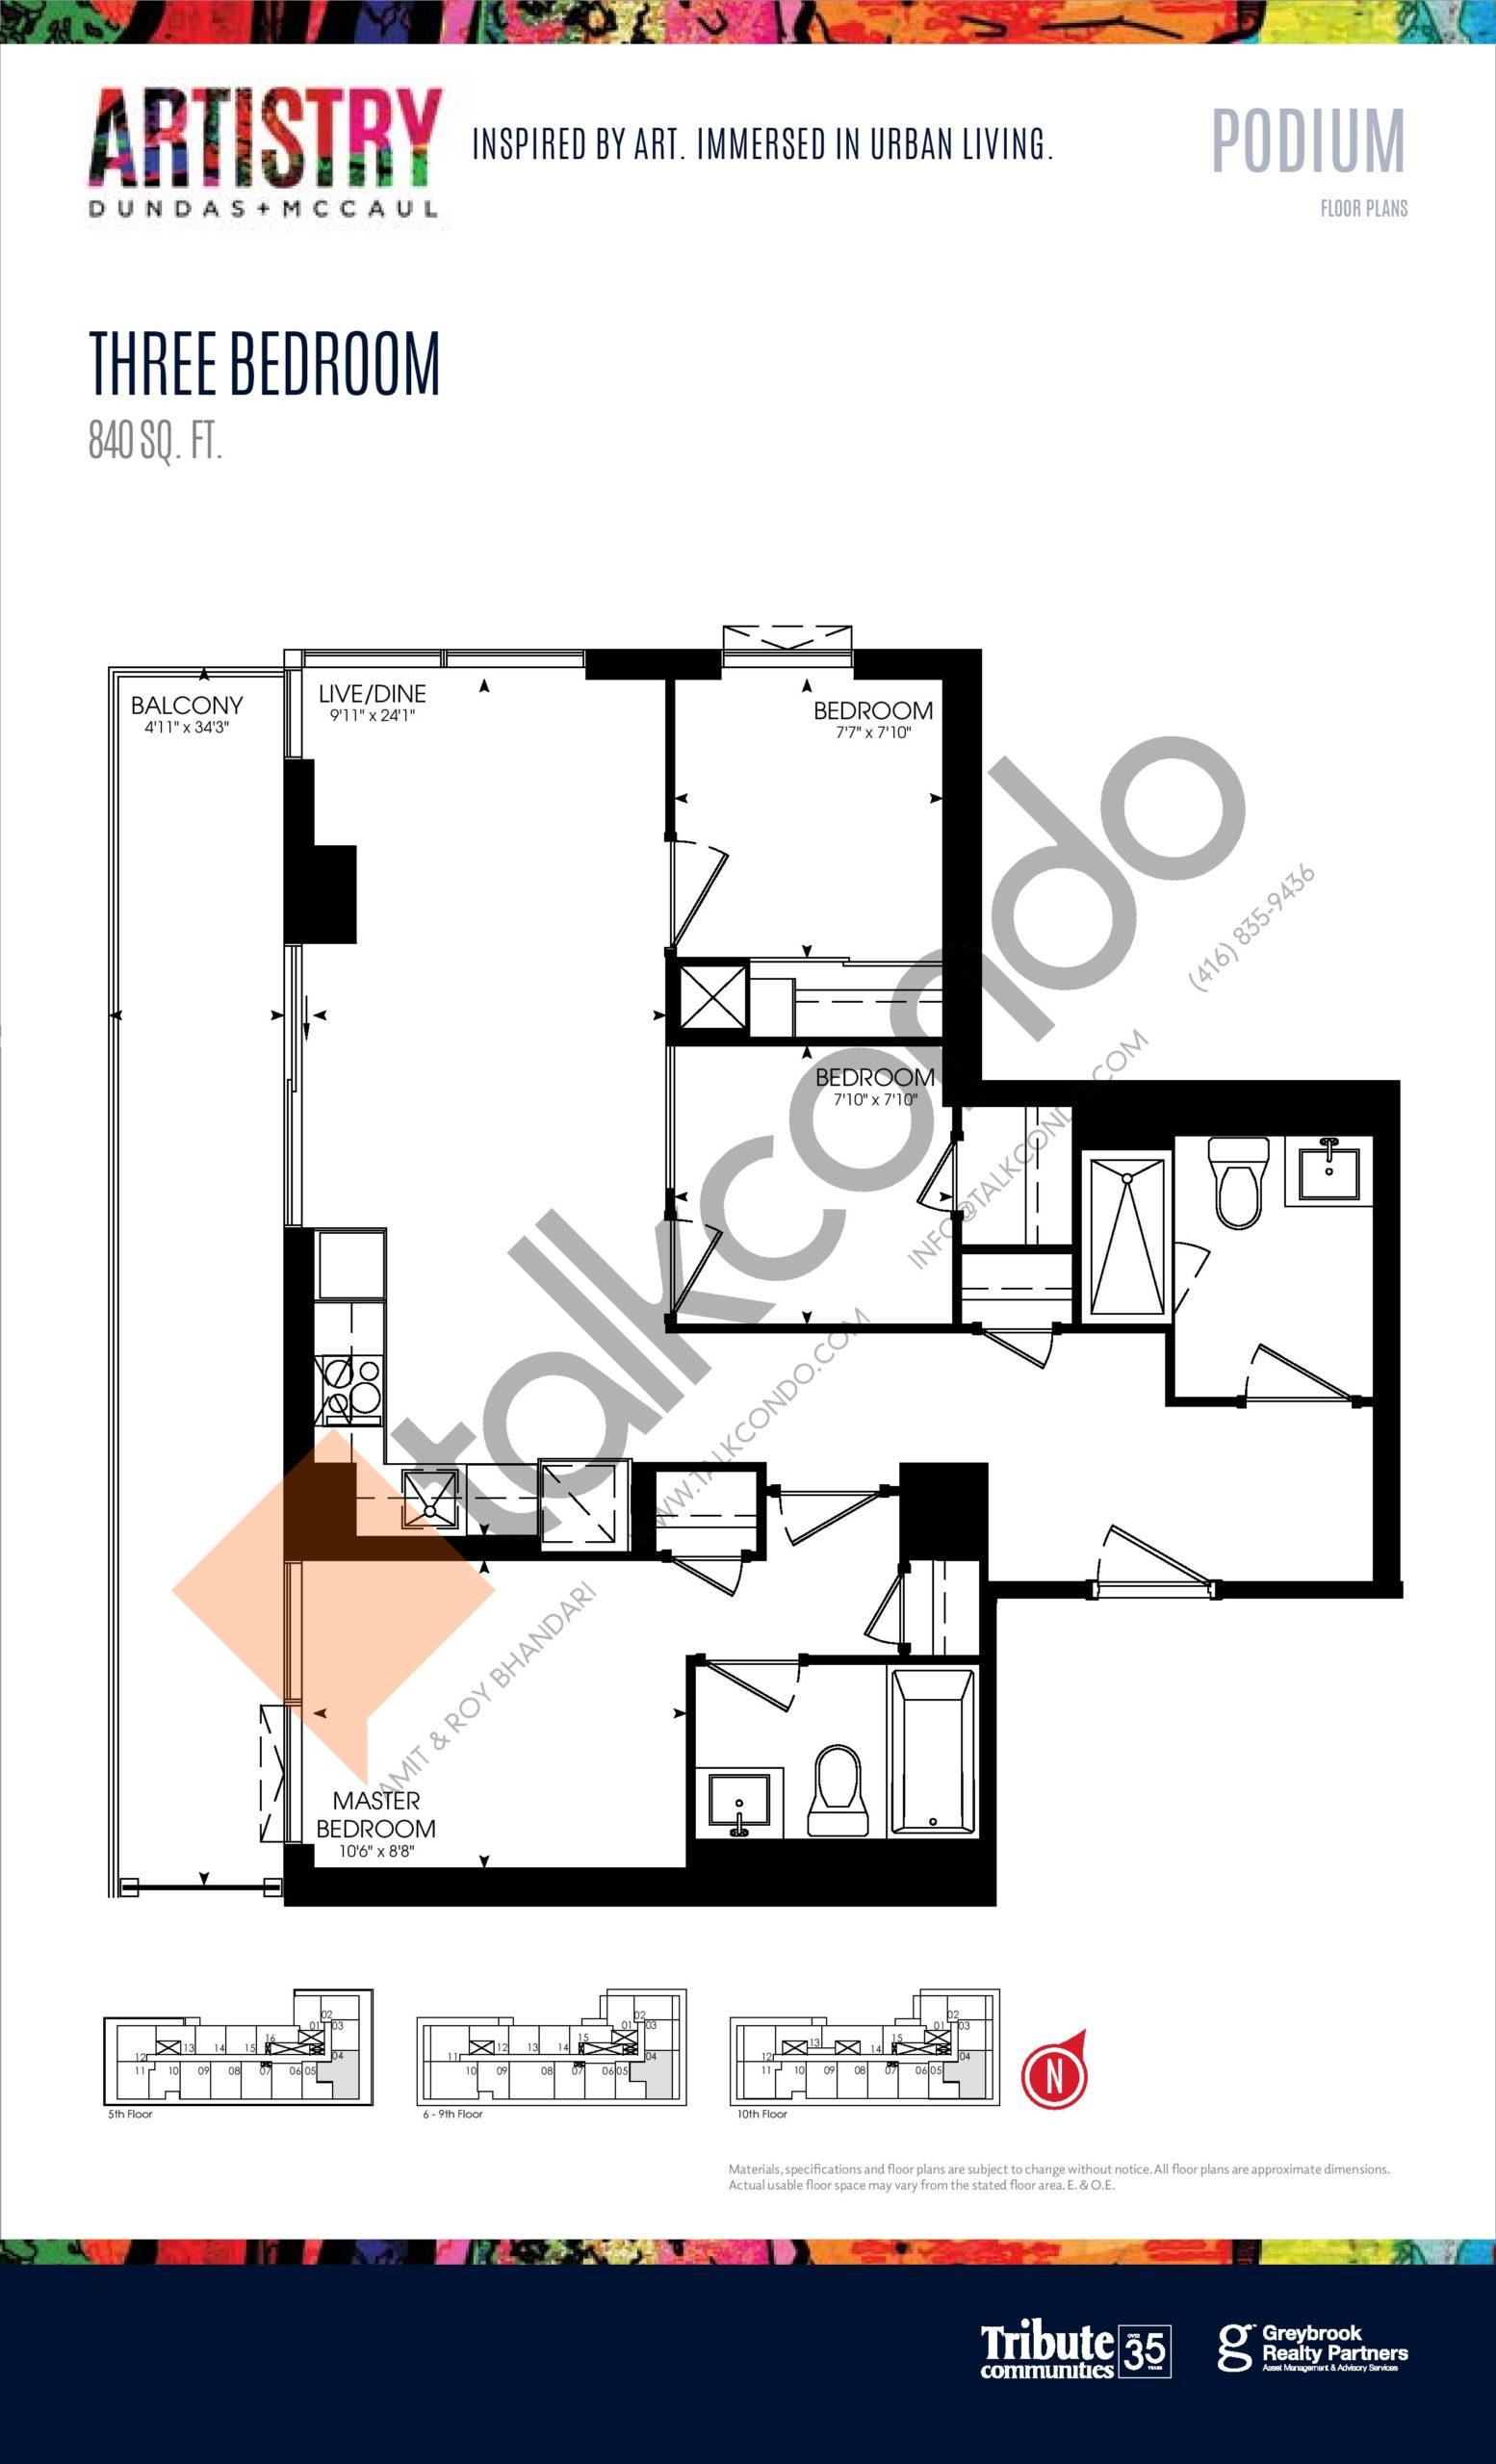 840 sq. ft. - Podium Floor Plan at Artistry Condos - 840 sq.ft